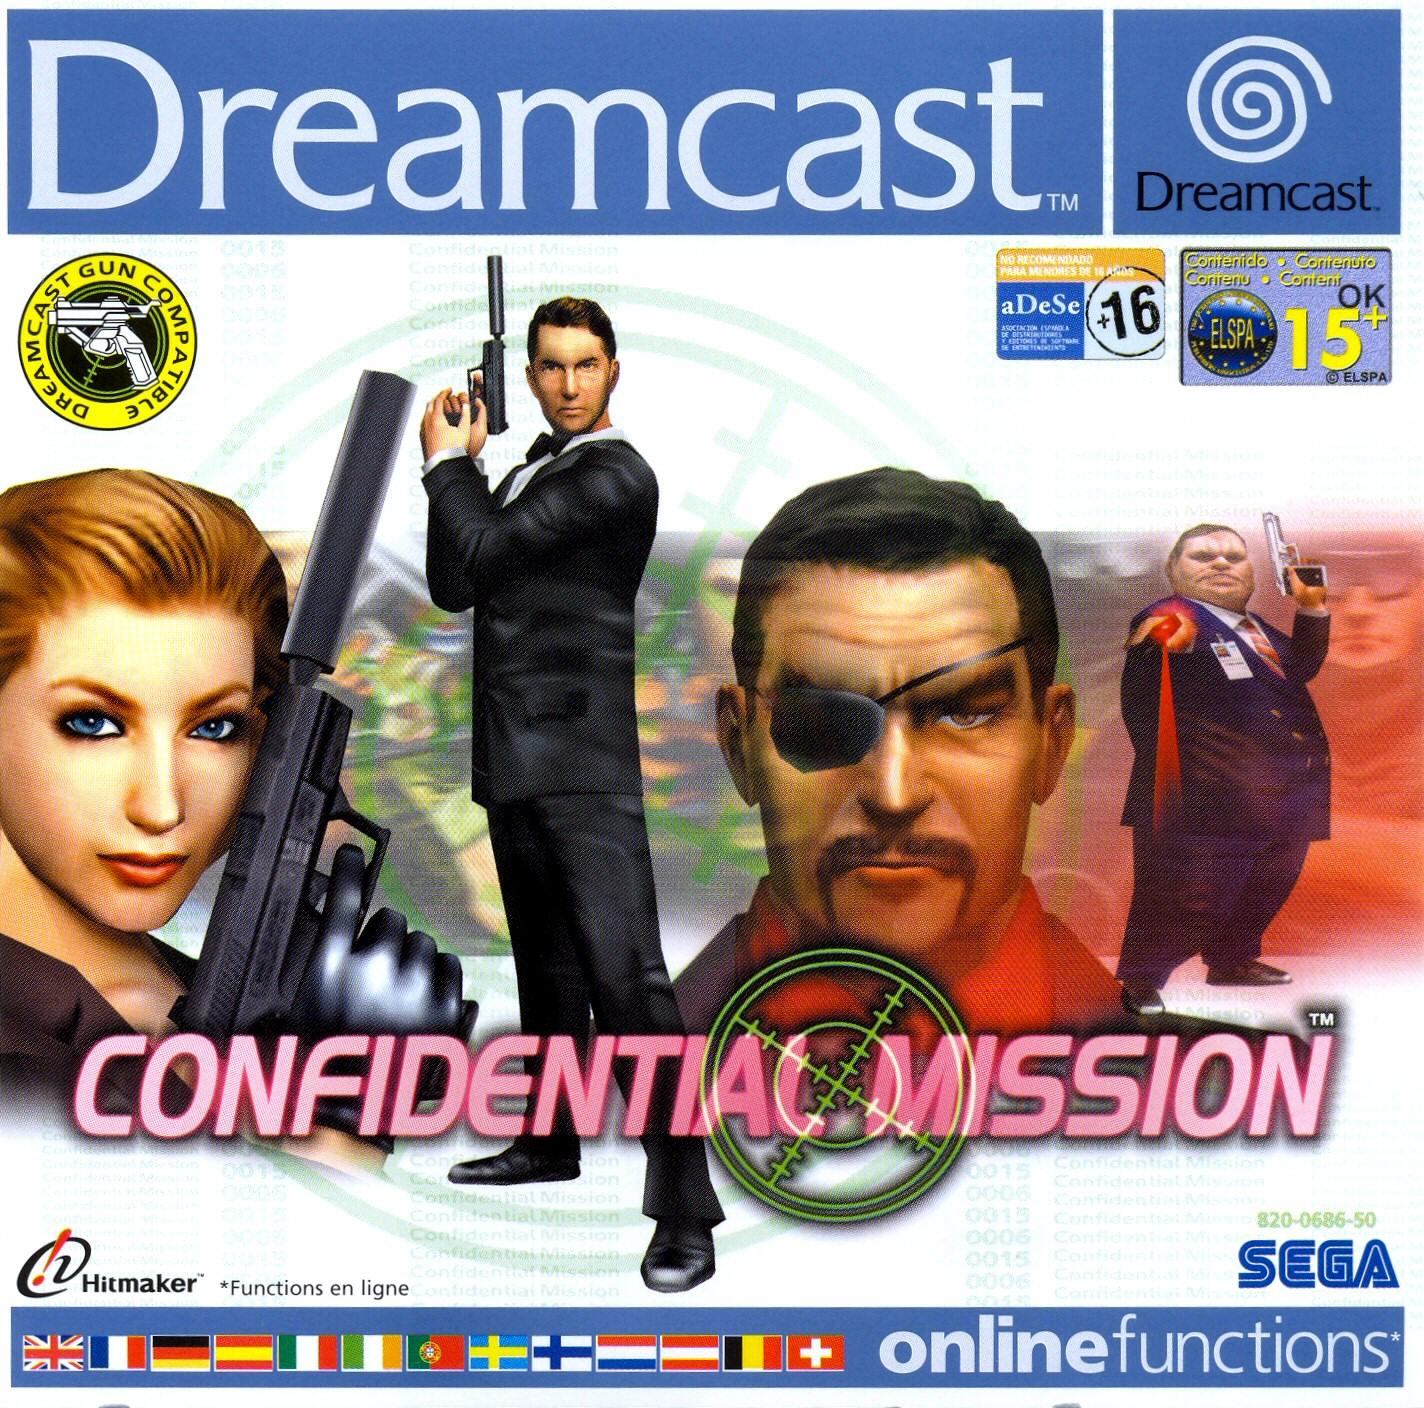 Confidential Mission, Sega Hitmaker (2001) Dreamcast   Games Revisited